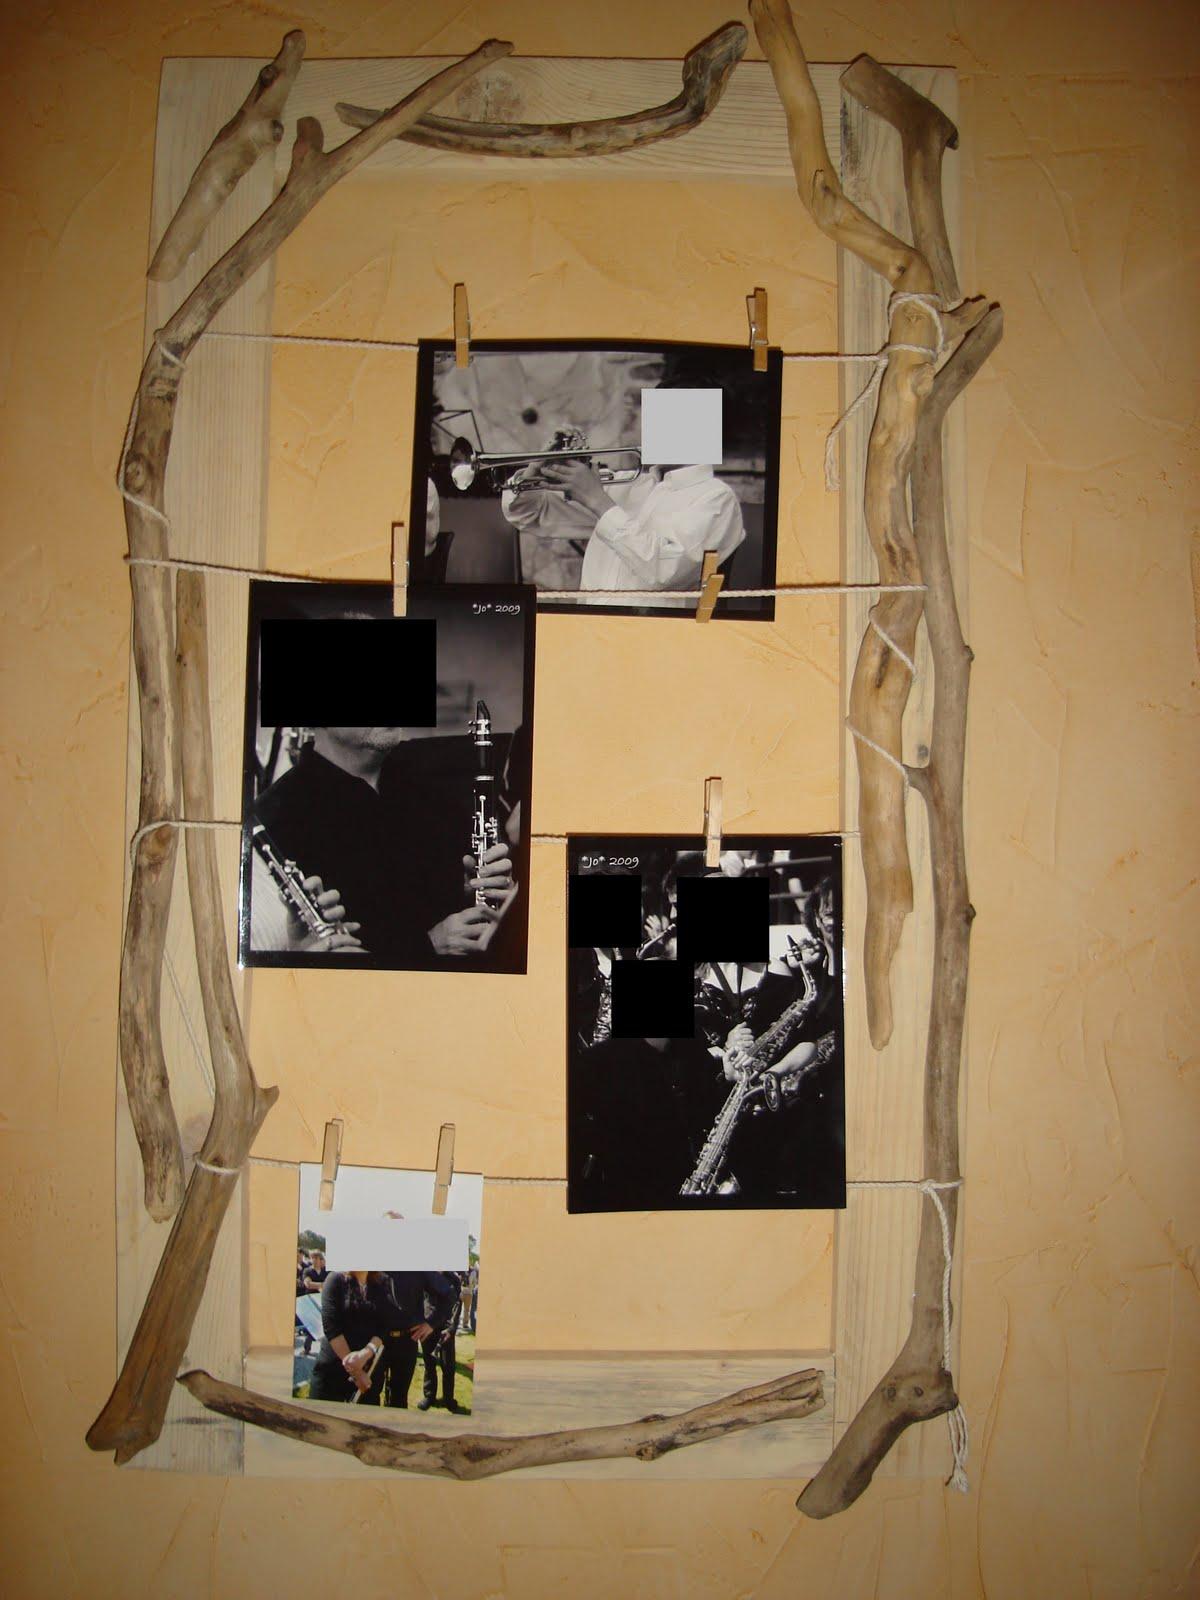 esprit recup 39 porte photos et pele mele. Black Bedroom Furniture Sets. Home Design Ideas